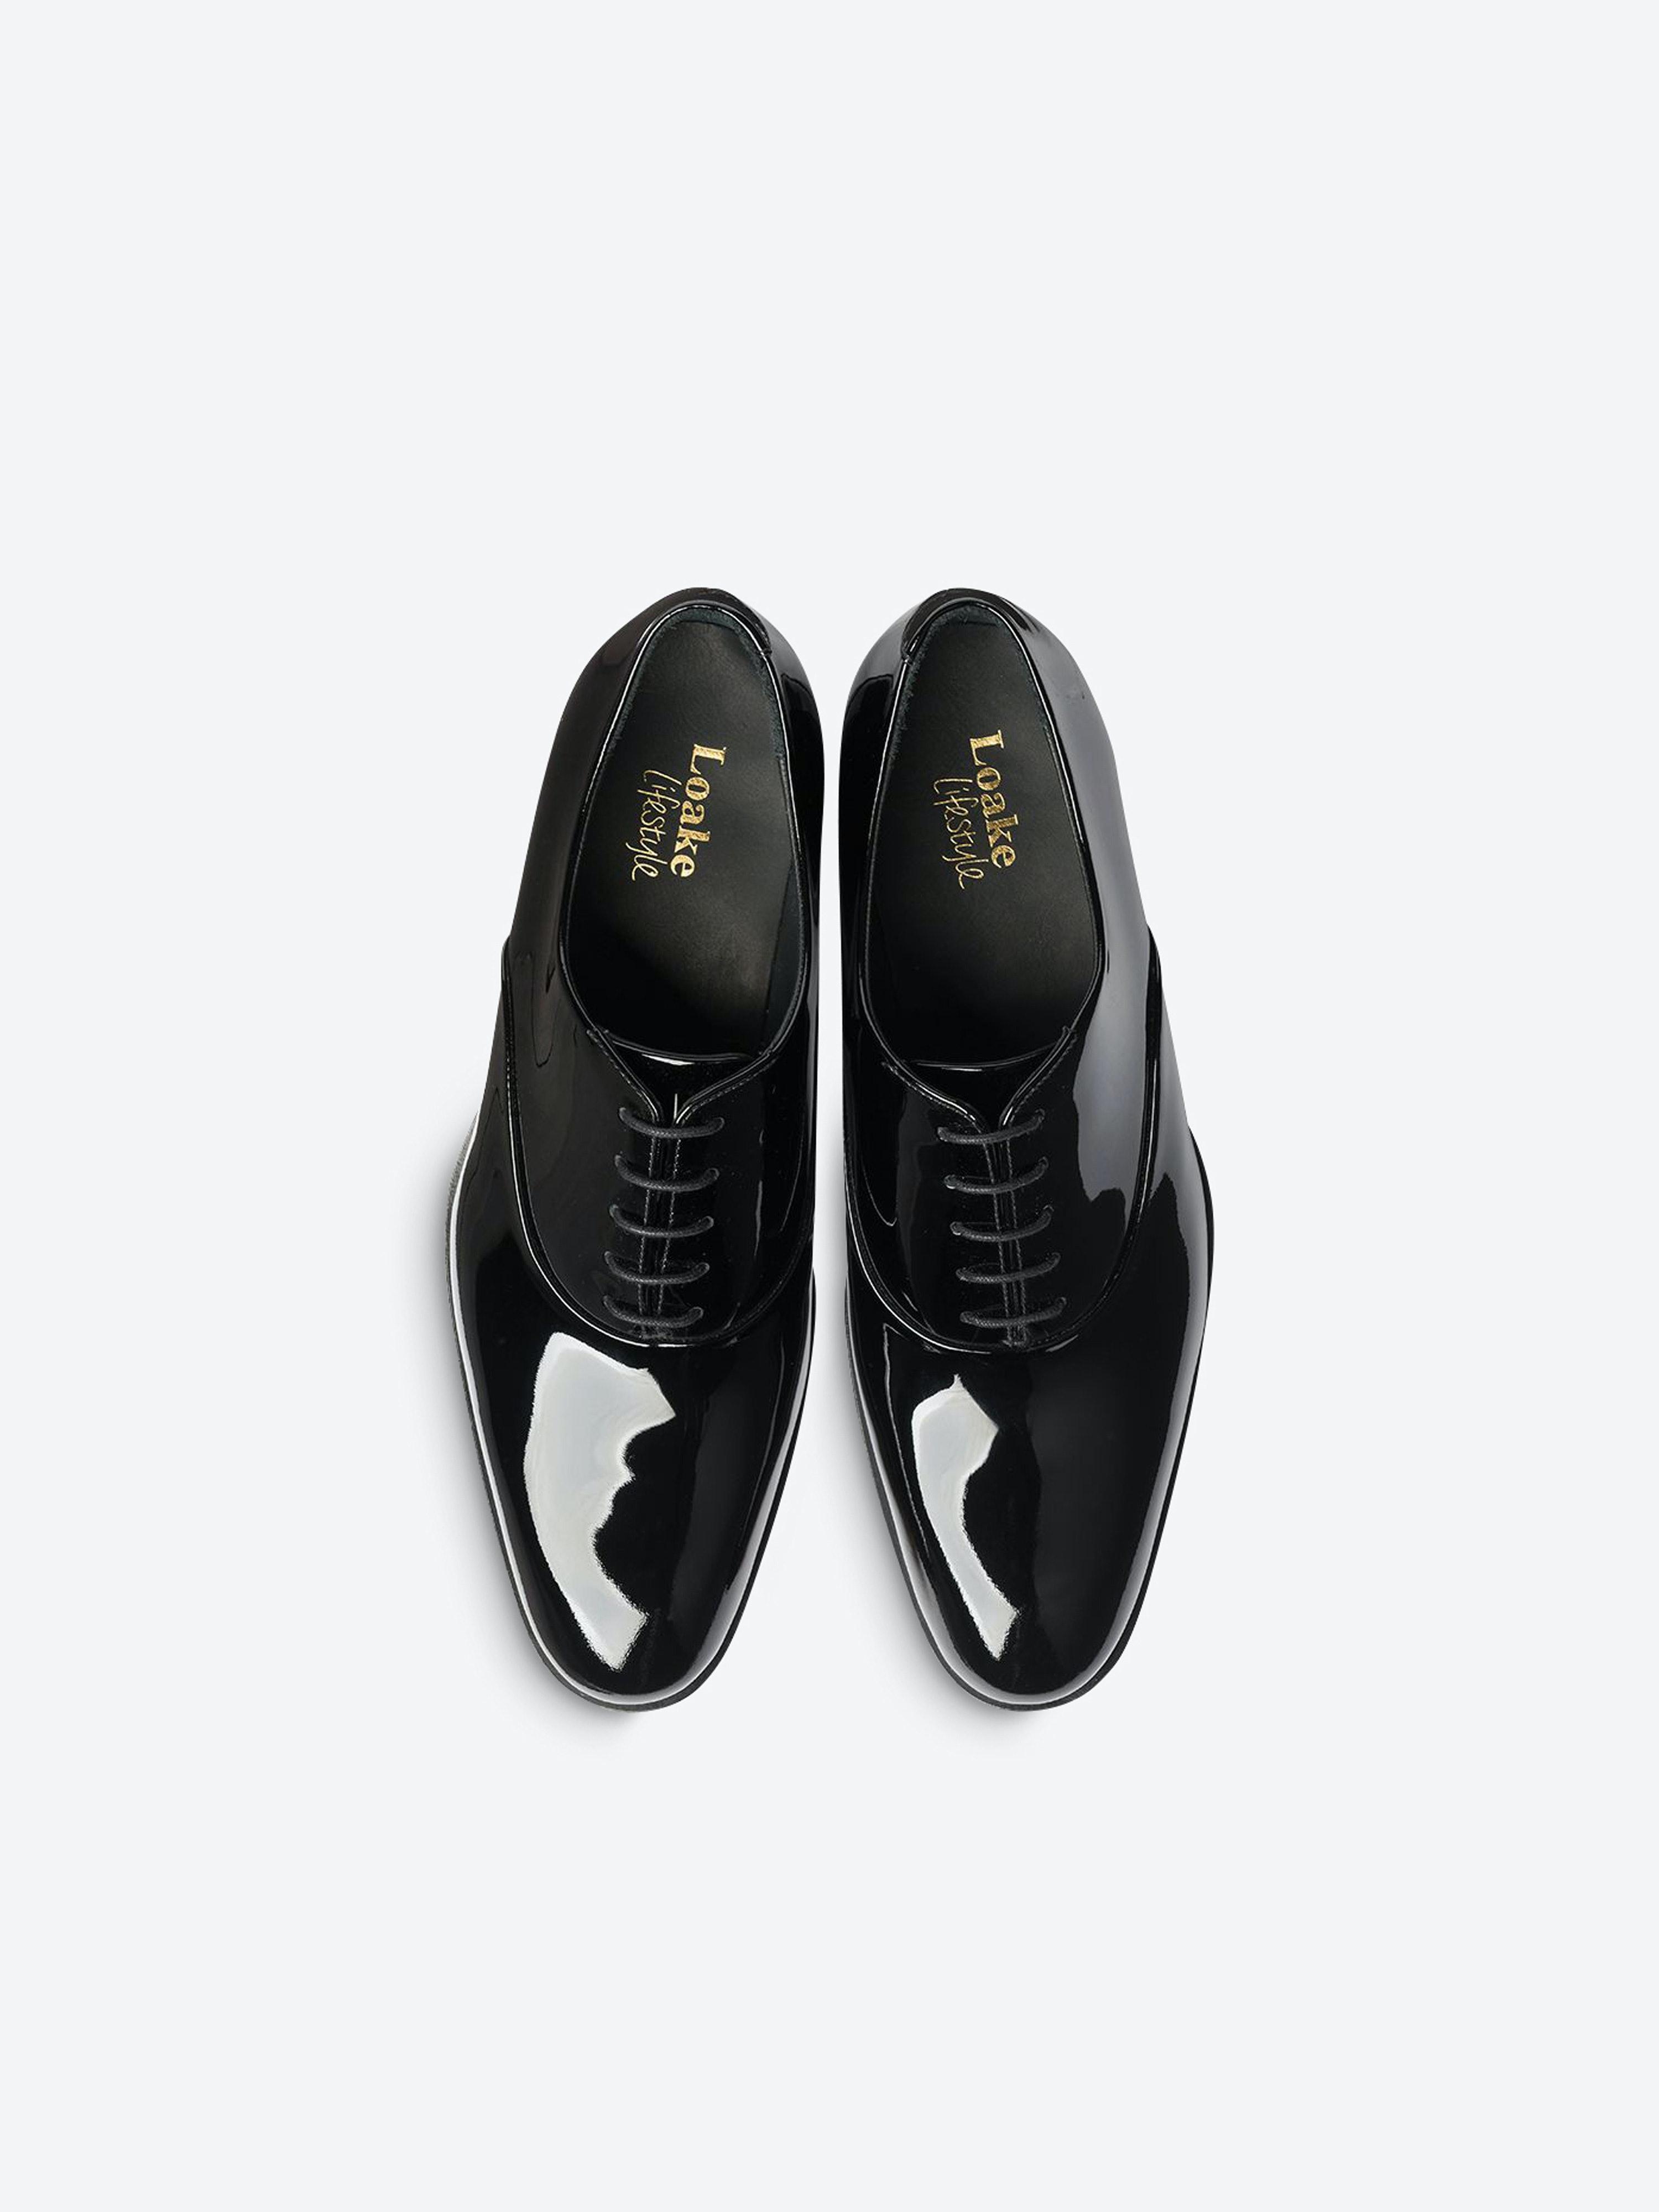 Loake Patent Leather Shoes Black   Men